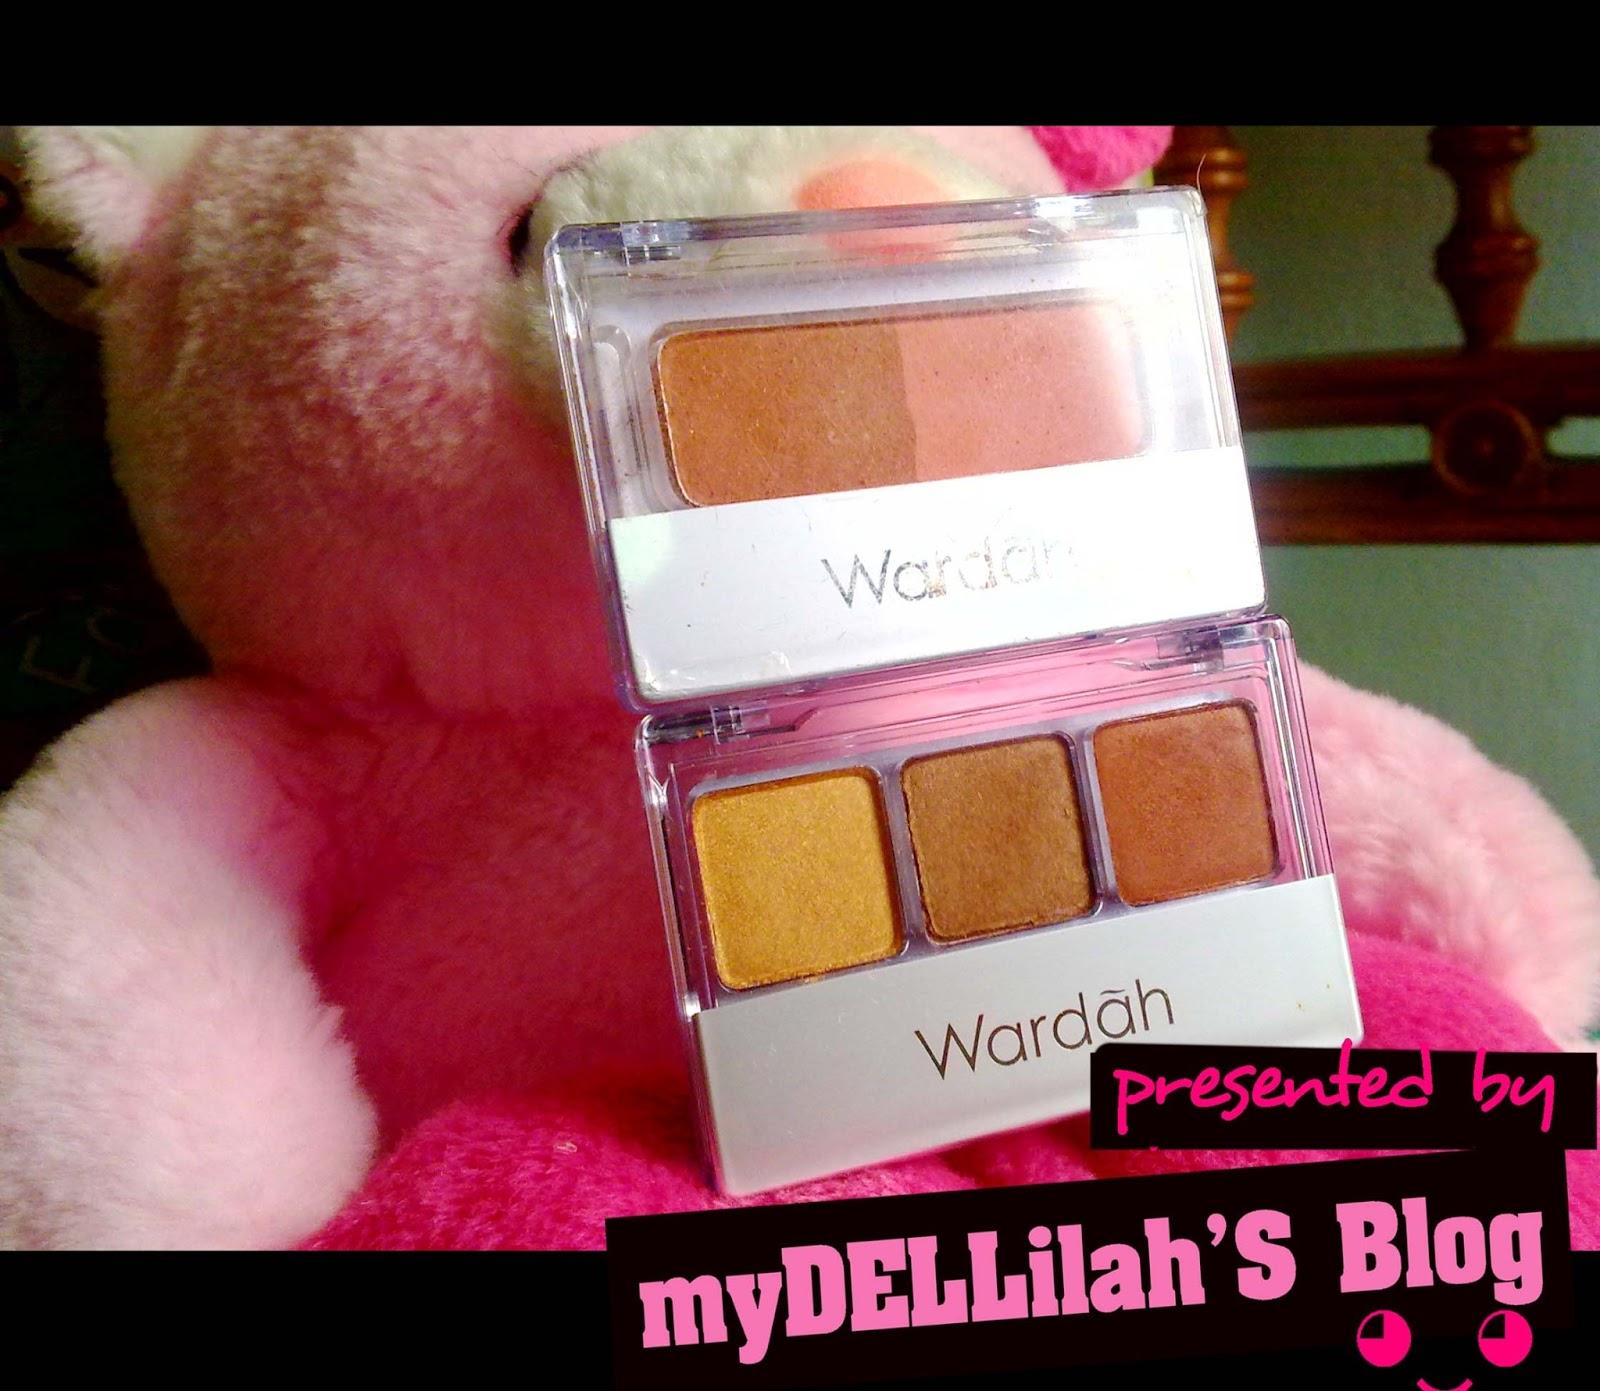 Wardah Eyeshadow and Blush